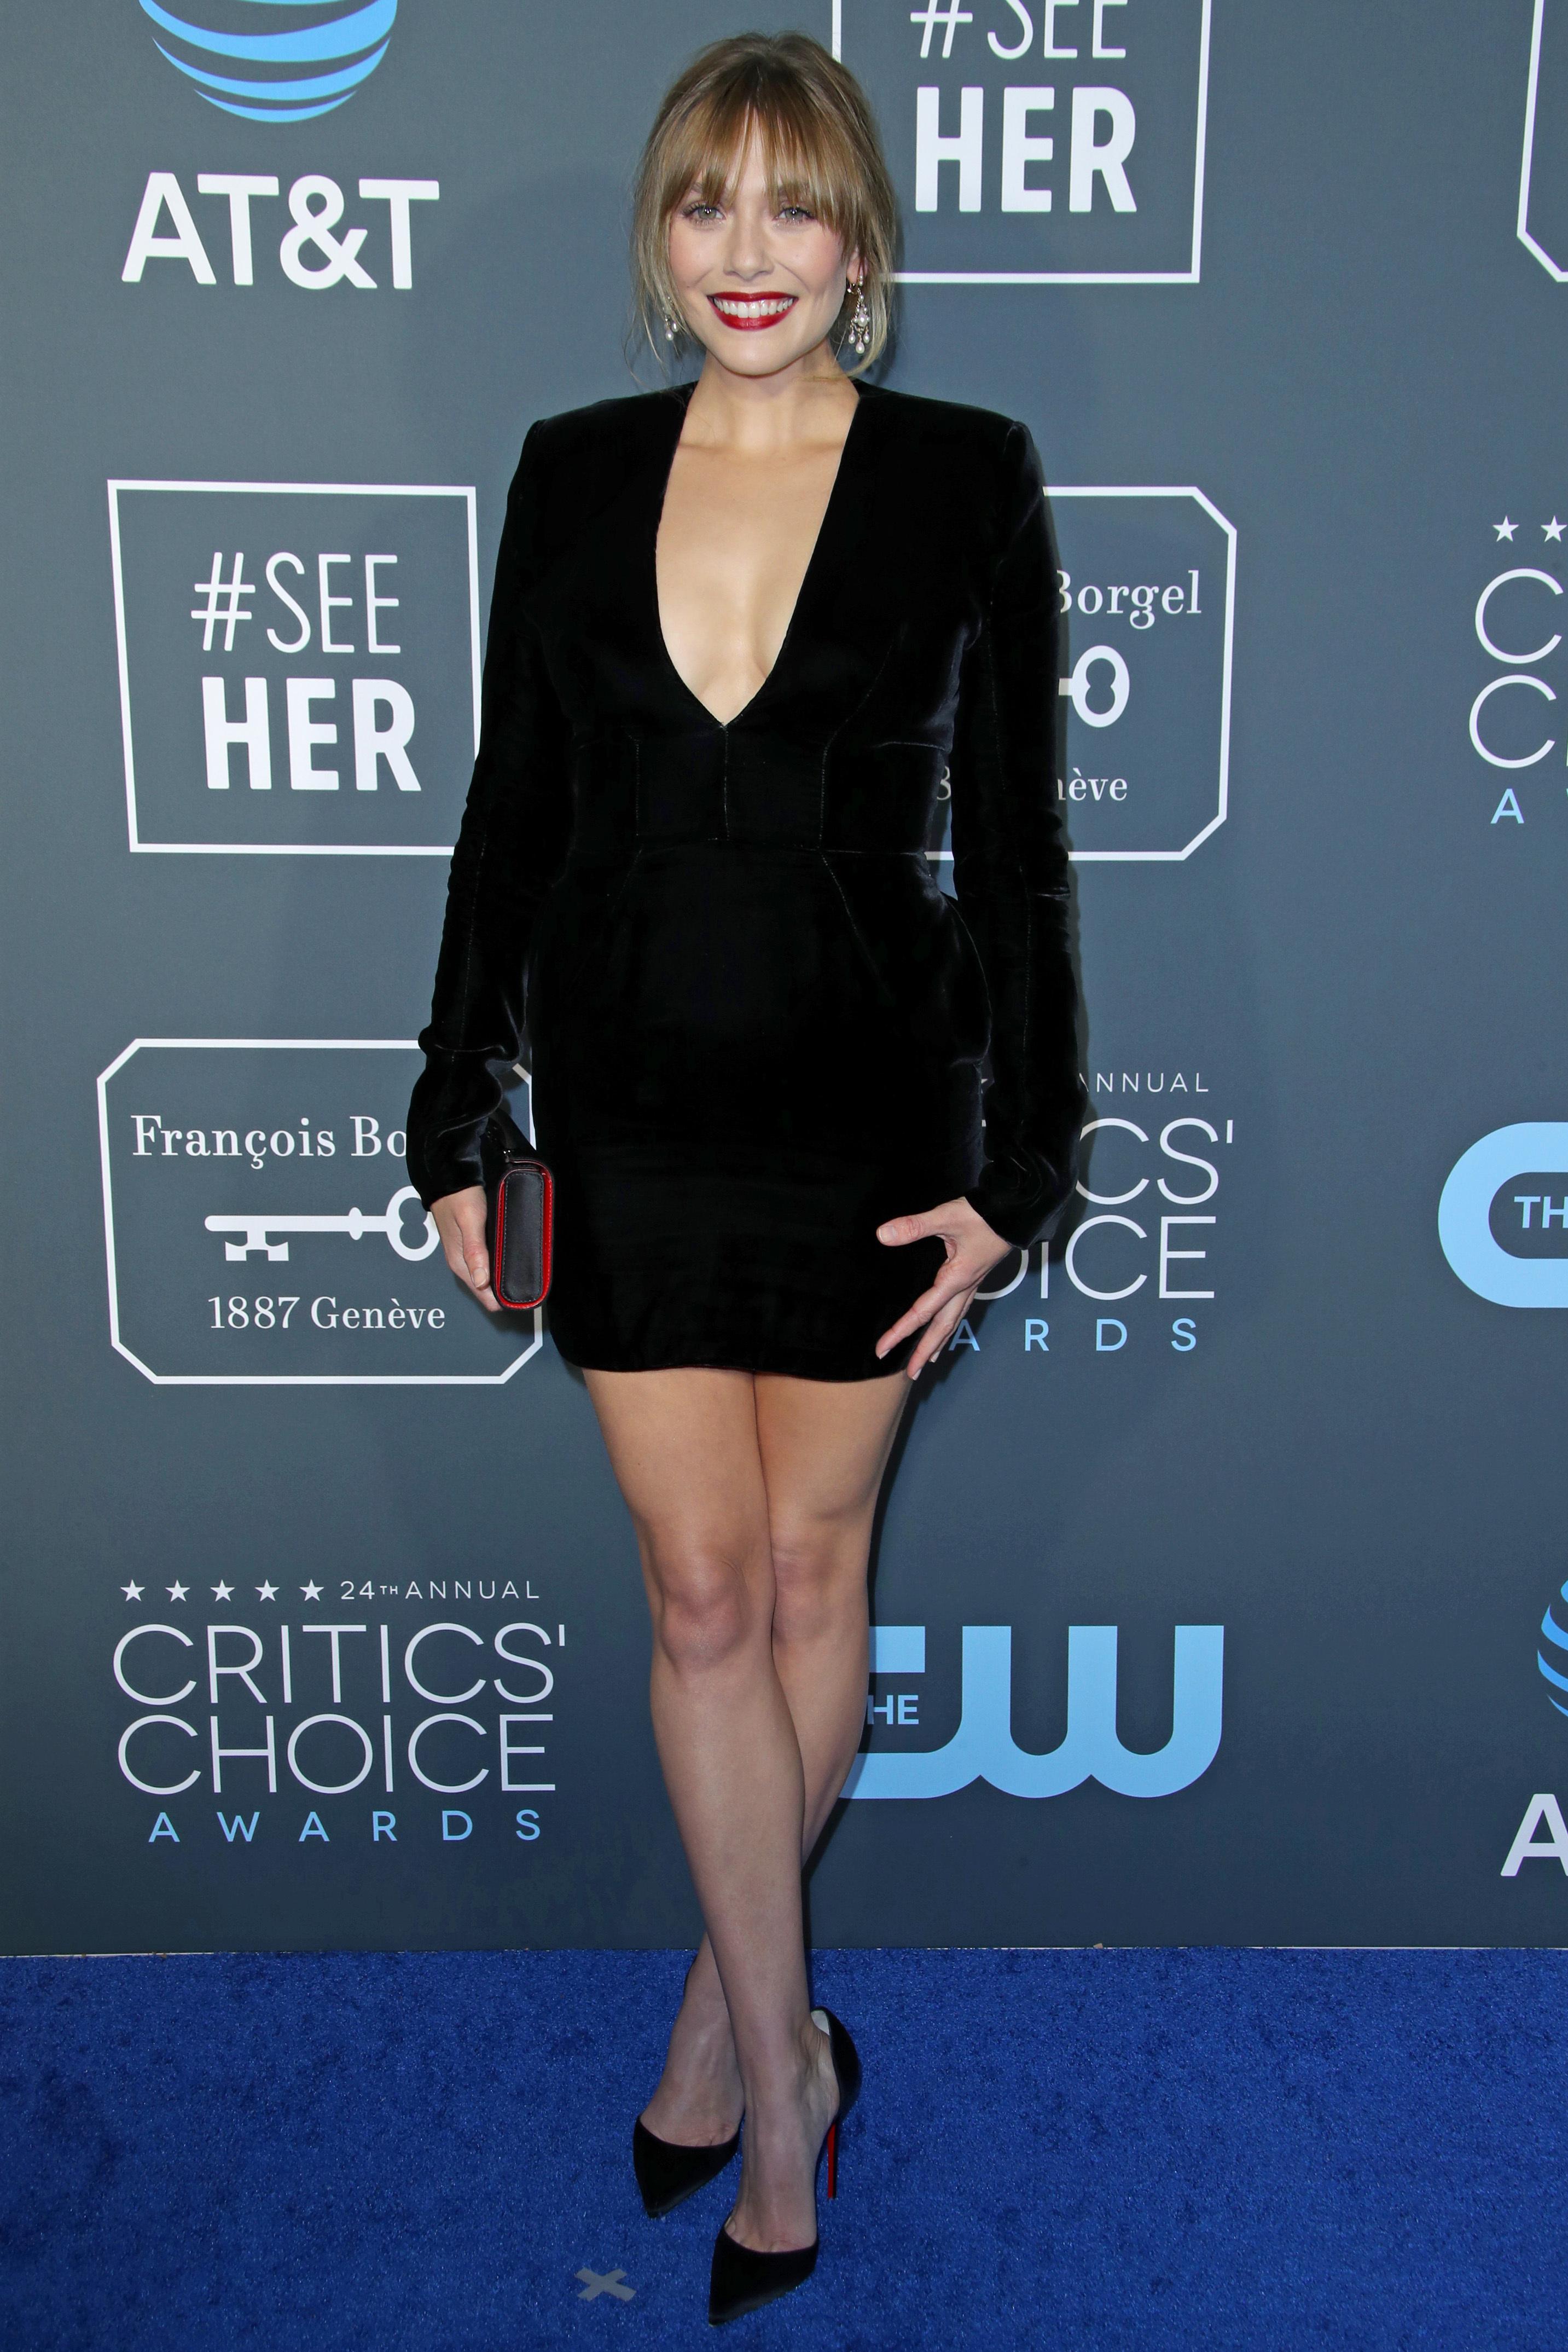 Elizabeth Olsen attends the 24th Annual Critics' Choice Awards at Barker Hanger in Santa Monica, California, on Jan. 13, 2019.